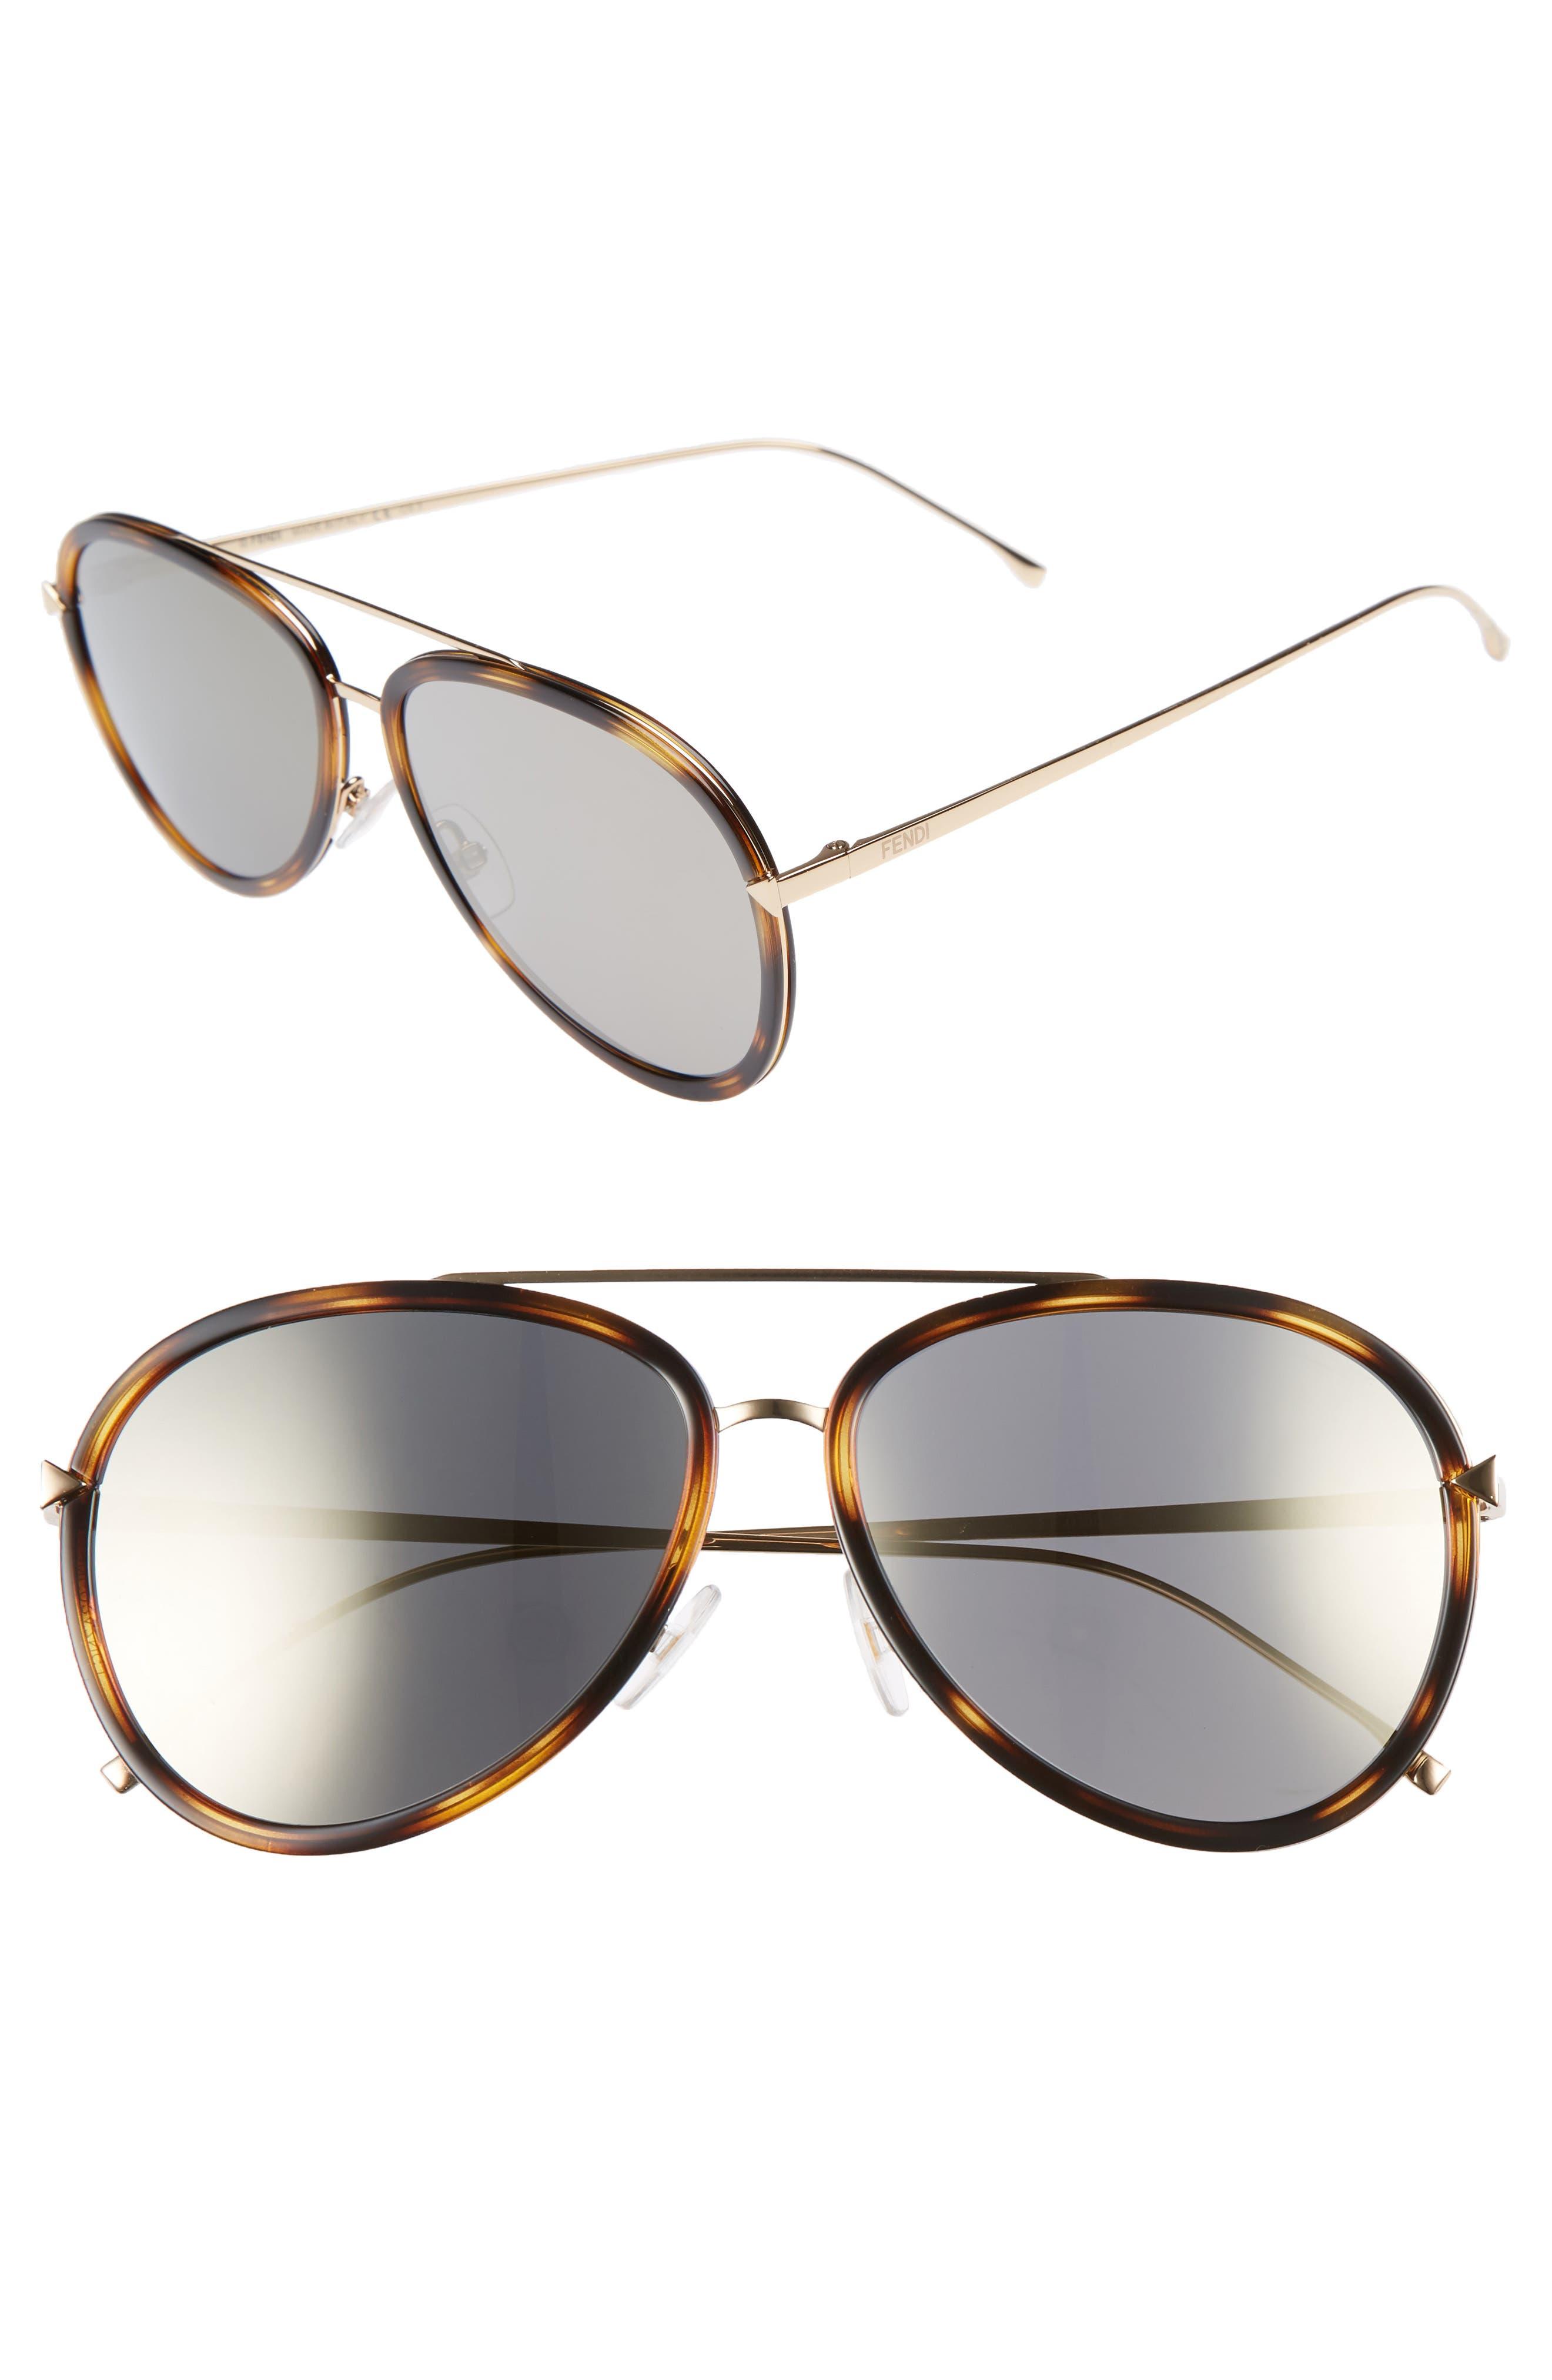 Fendi Sunglasses 57MM MIRRORED LENS AVIATOR SUNGLASSES - HAVANA GOLD